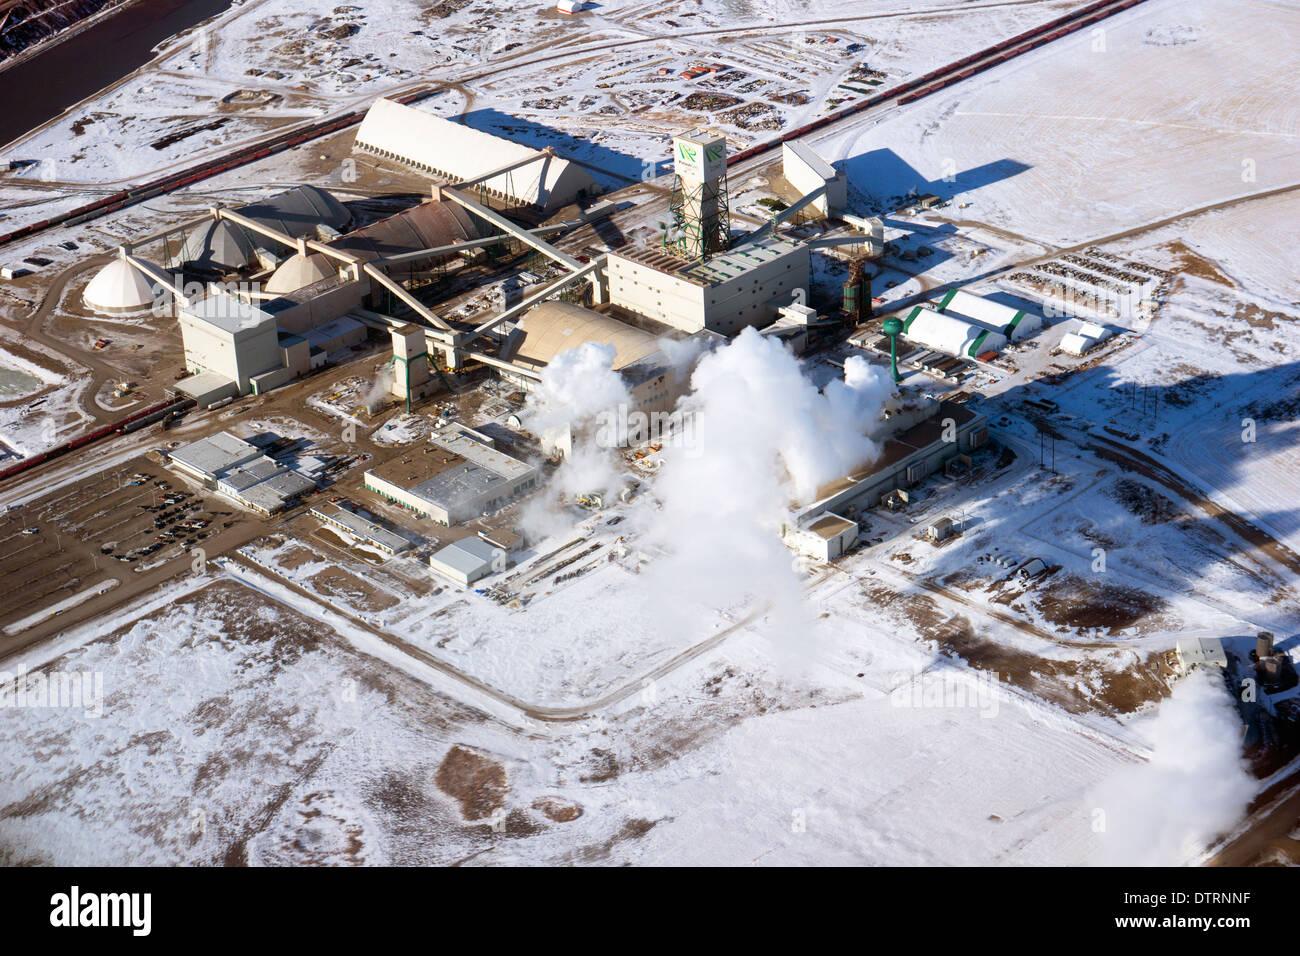 PotashCorp Cory Kali Fabrik produziert drei Pflanzen Nährstoffe Kali (K) Stickstoff (N) und Phosphat (P). Stockbild